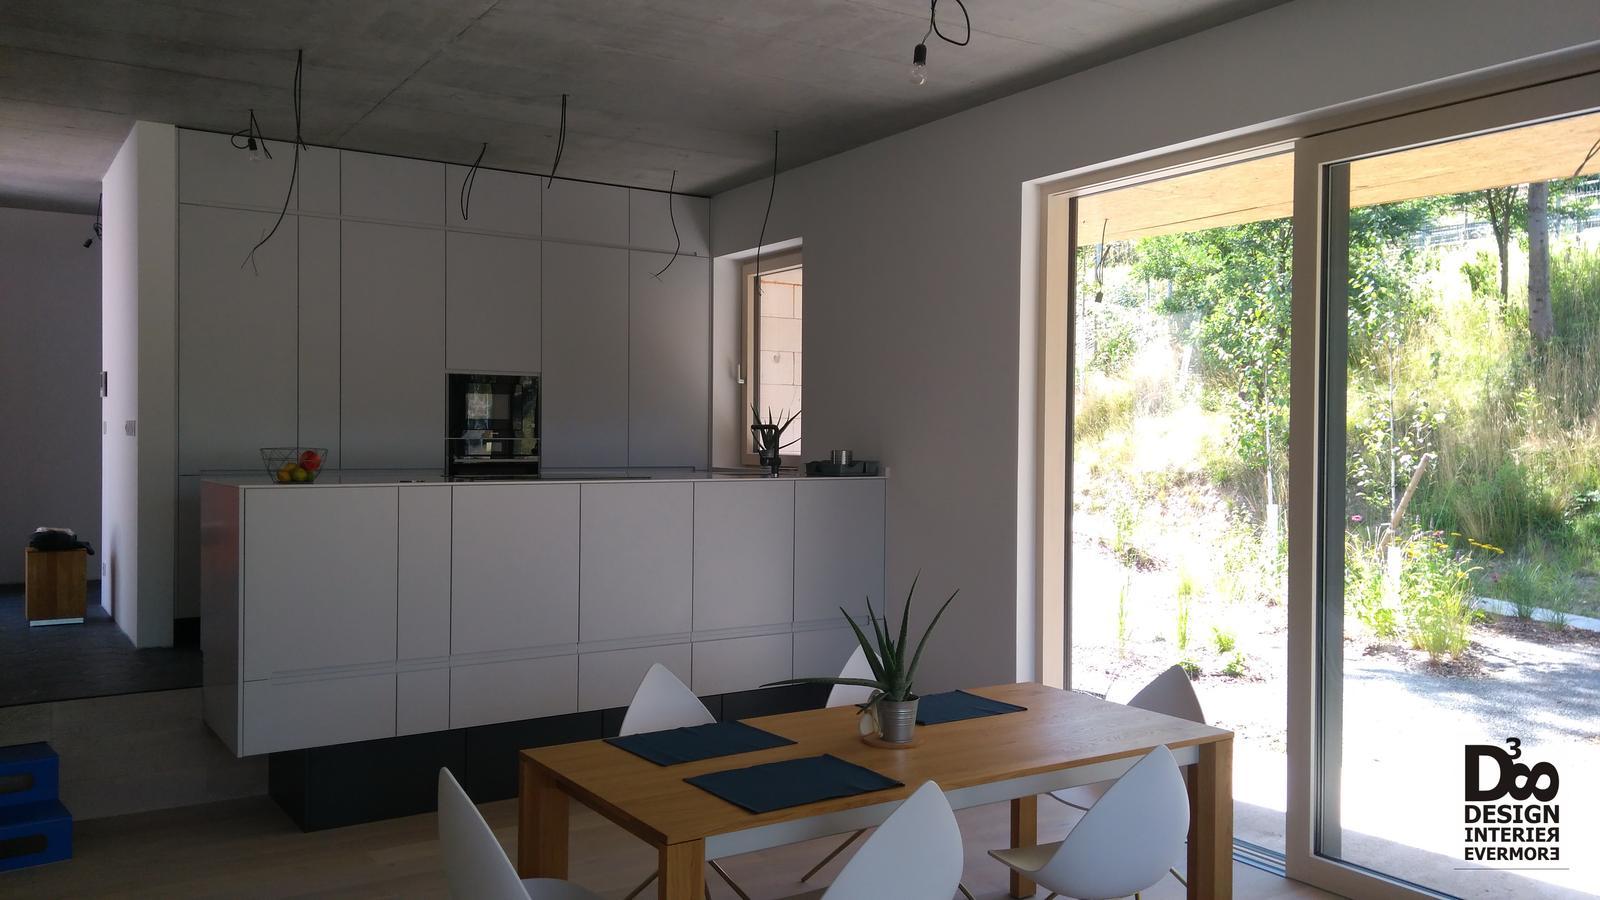 Moderná kuchyňa - Borinka 2018 - Obrázok č. 2